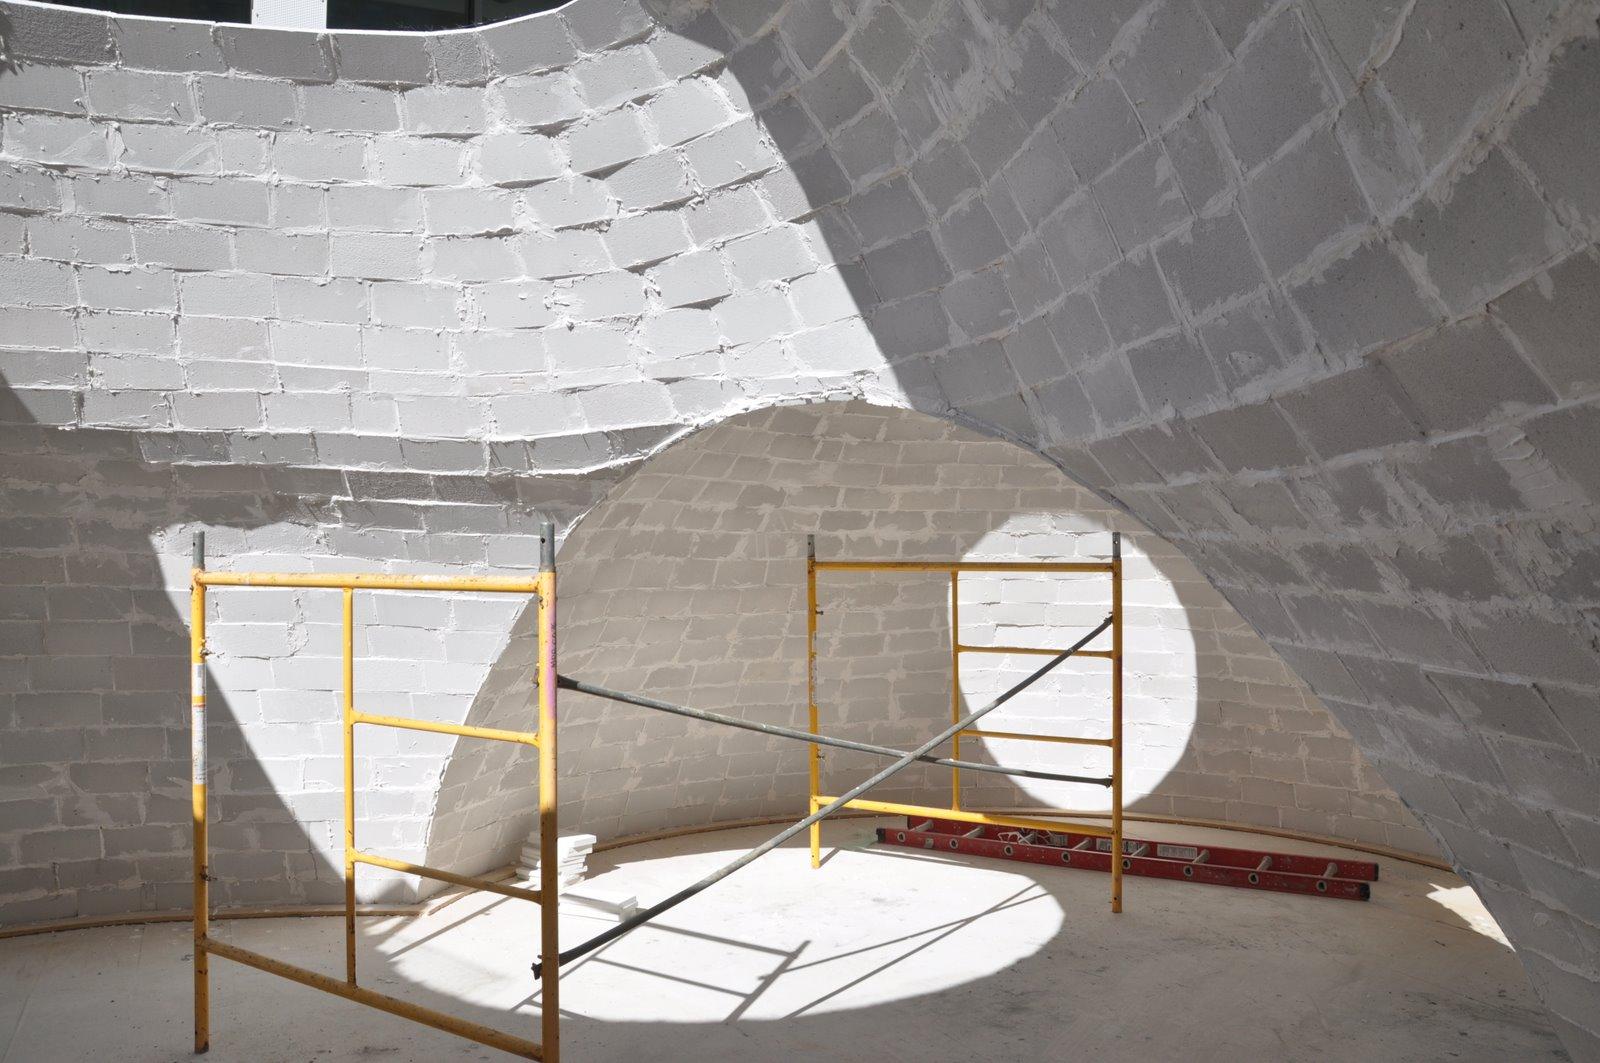 Reinforced Concrete Wall Design Eurocode : Masonry structural design pdf book downloads